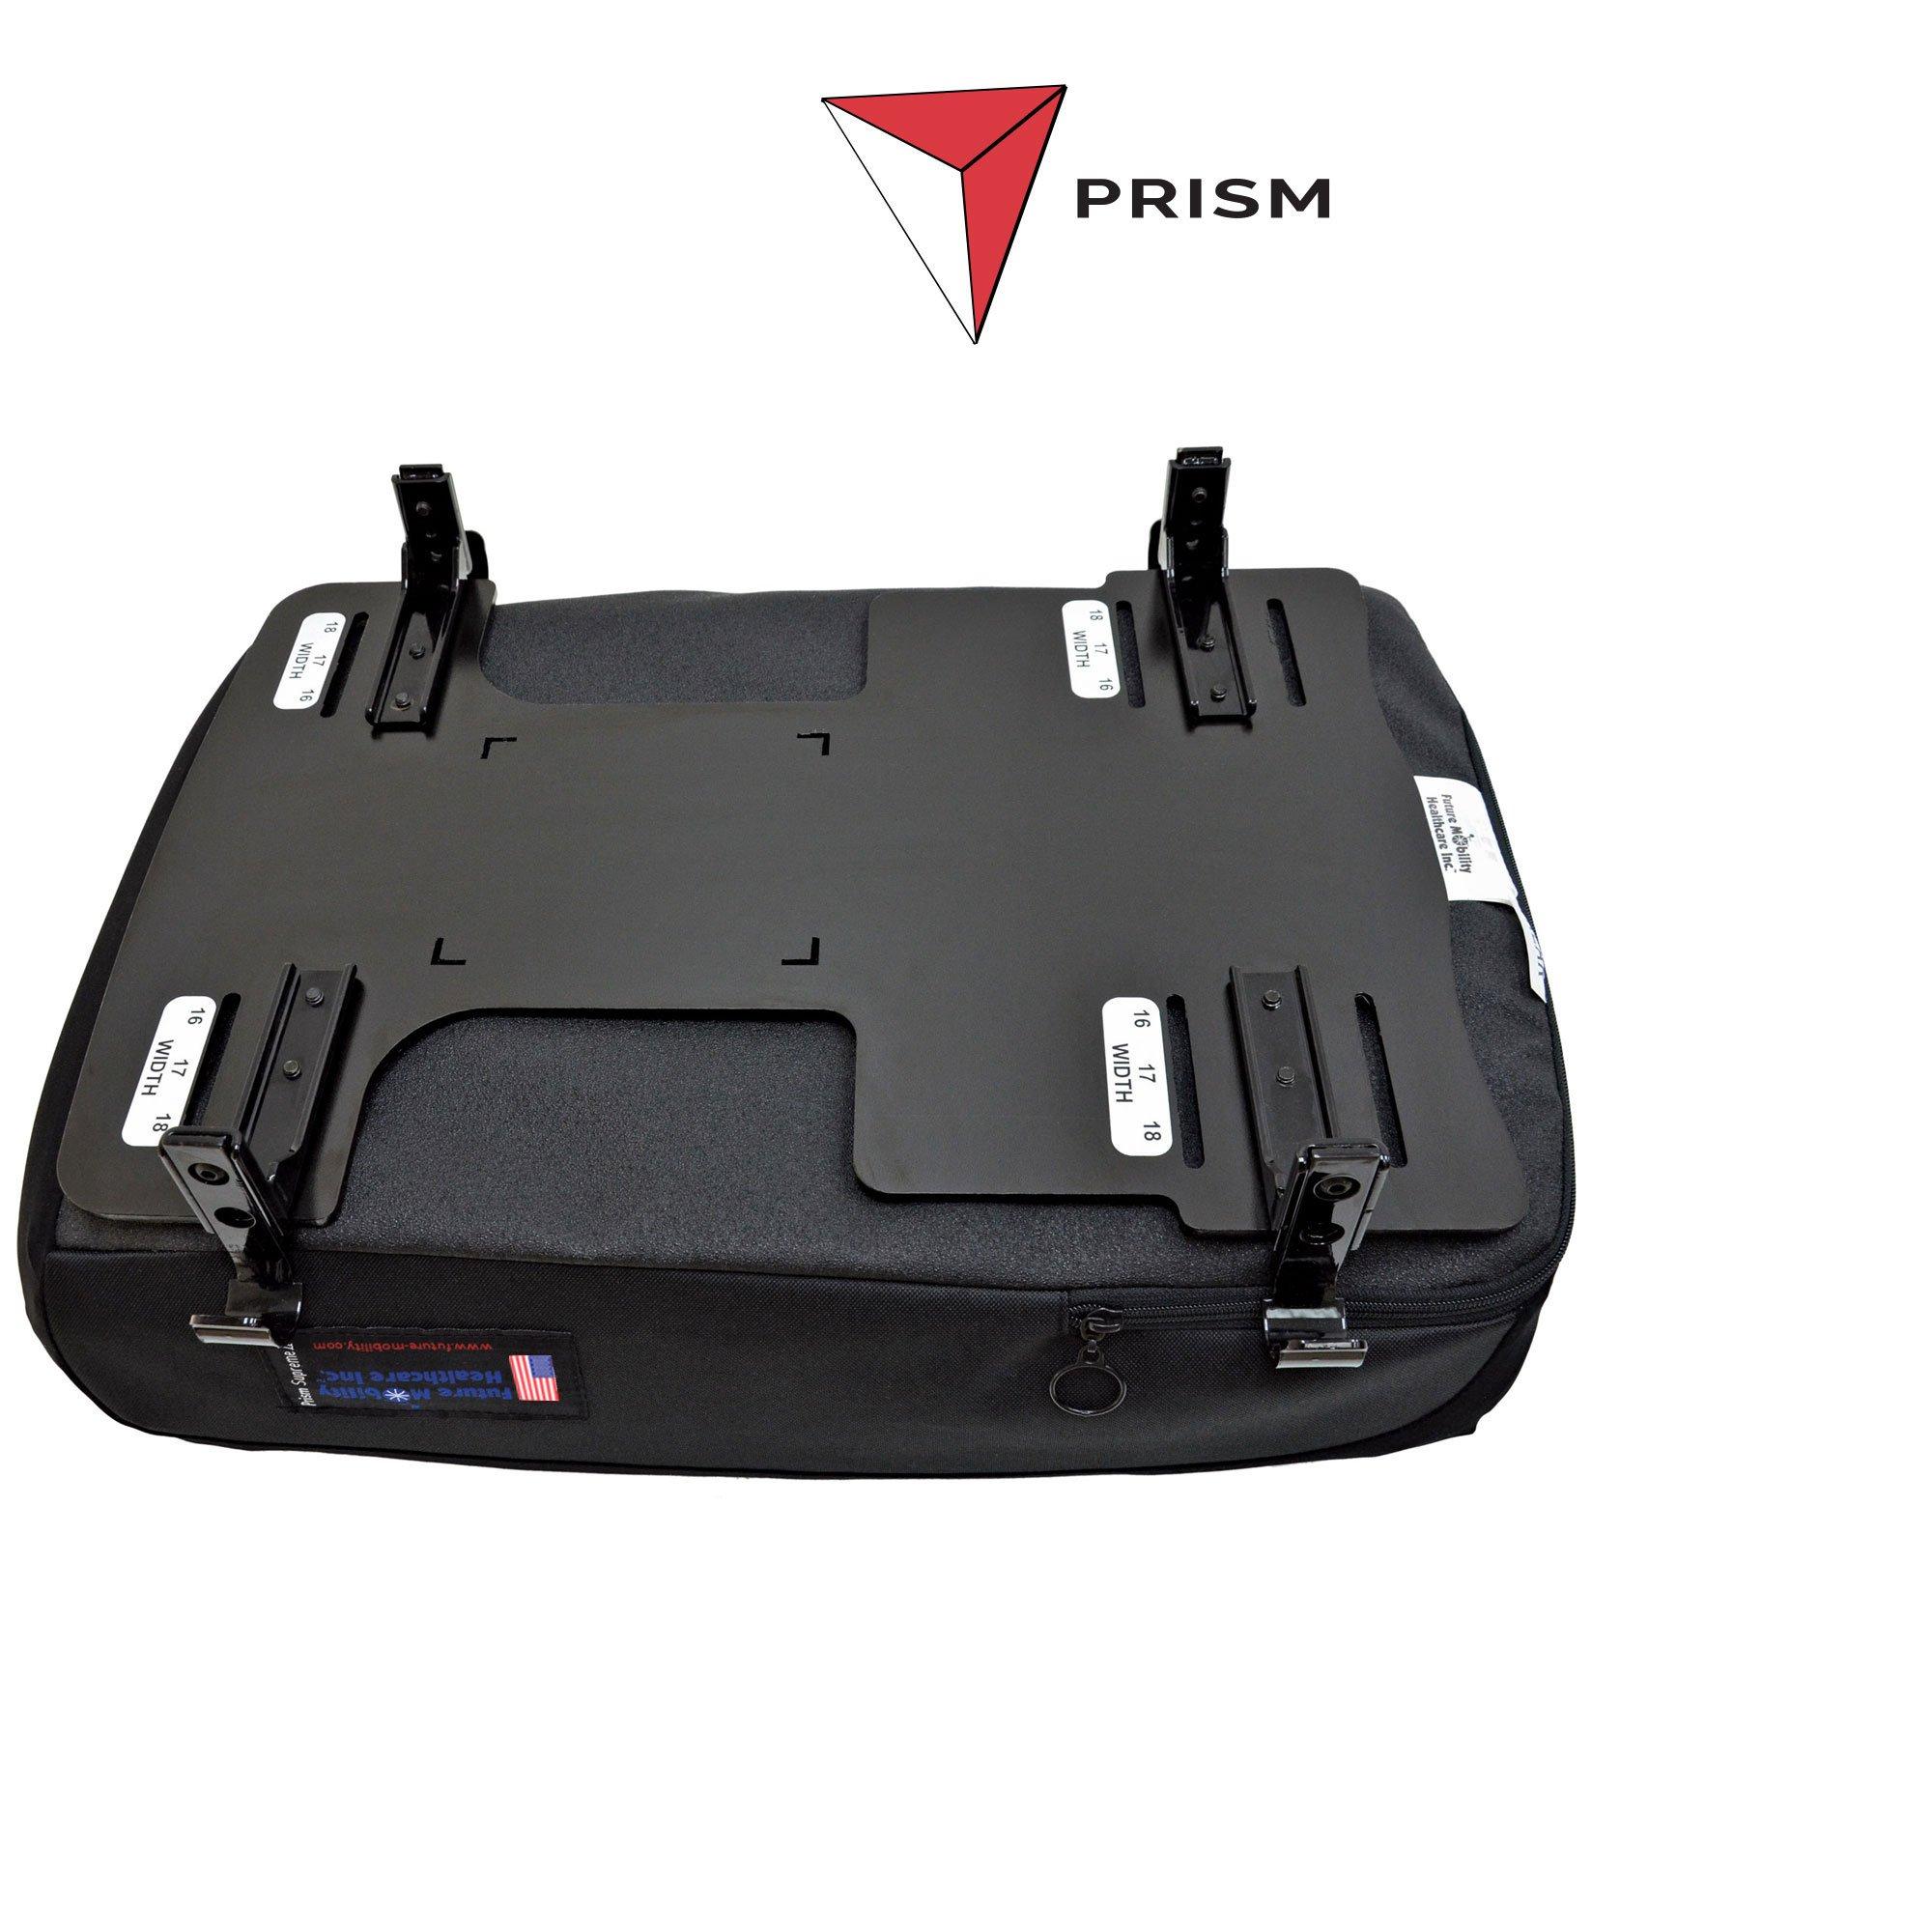 Wheelchair Cushion Prism Adjustable Drop Base